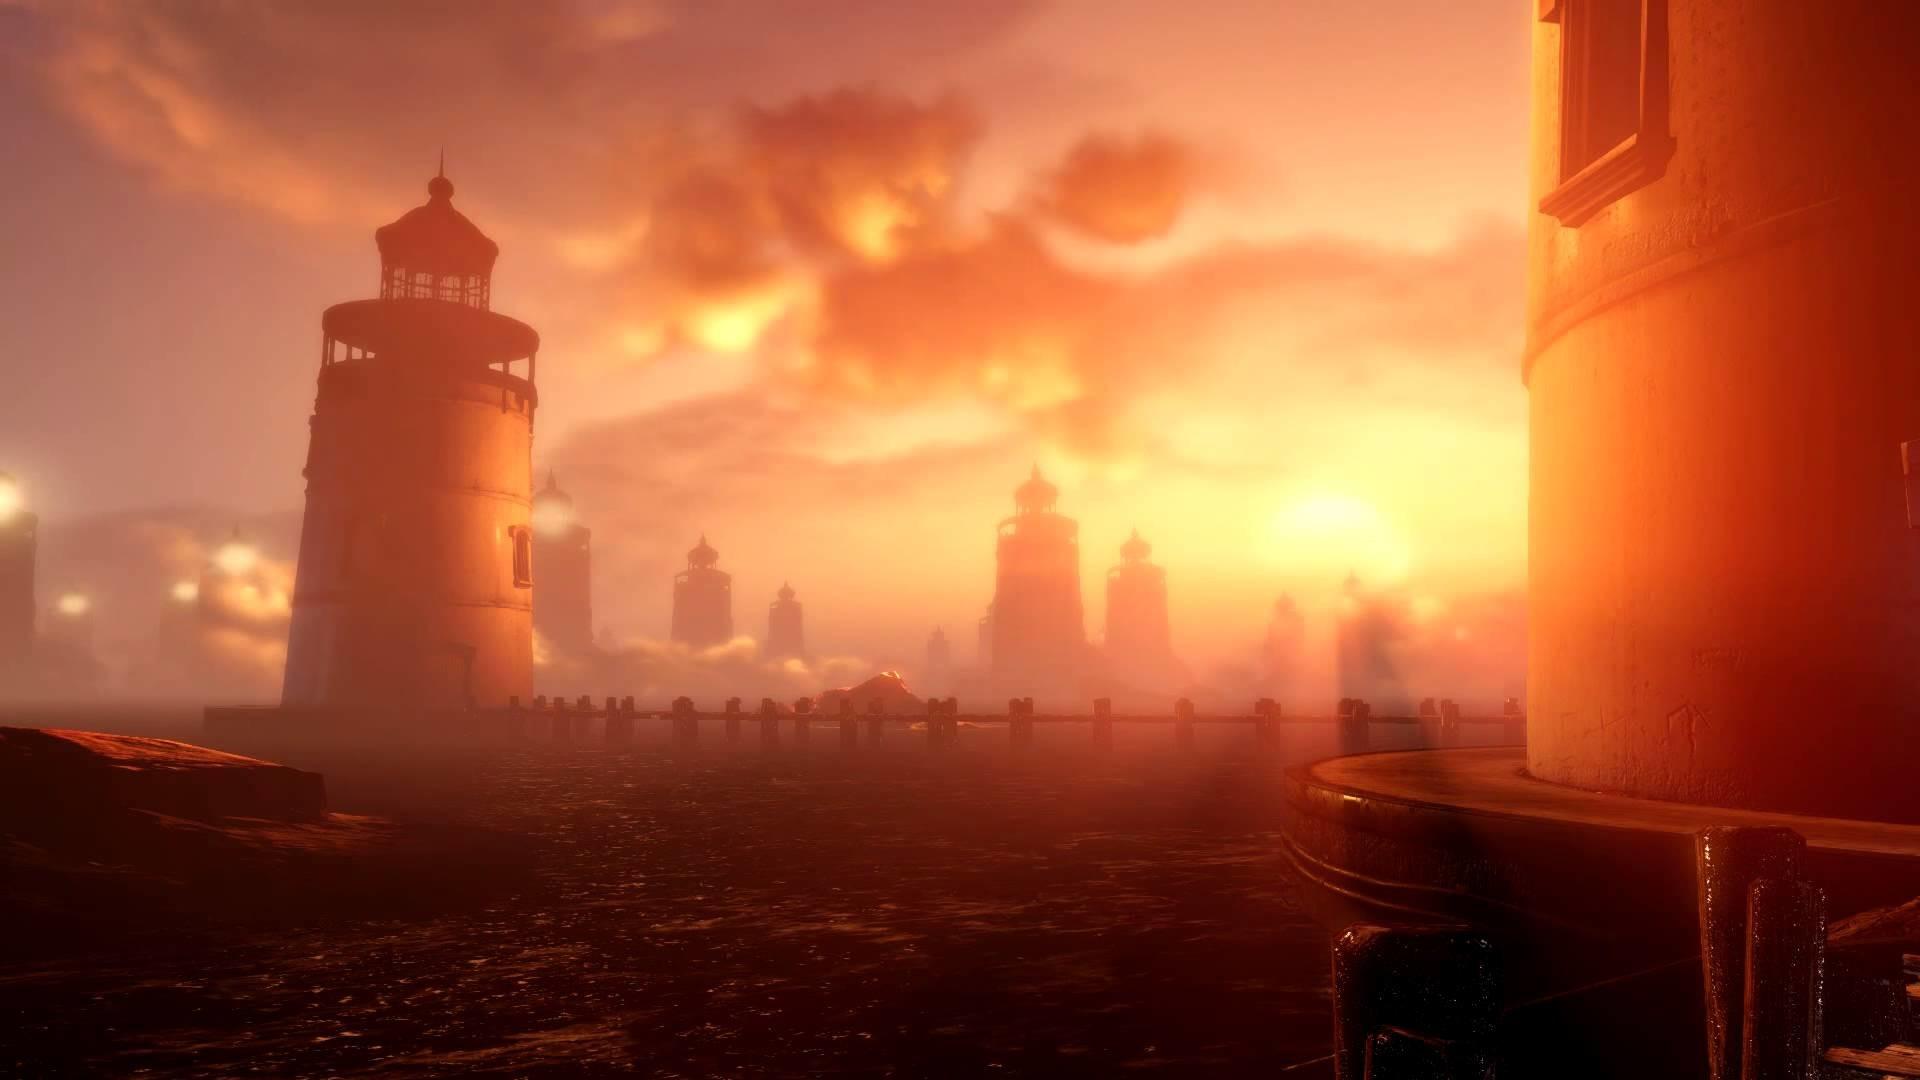 DreamScene [Live Wallpaper] – Bioshock Infinite – Lighthouse (1080p) –  YouTube